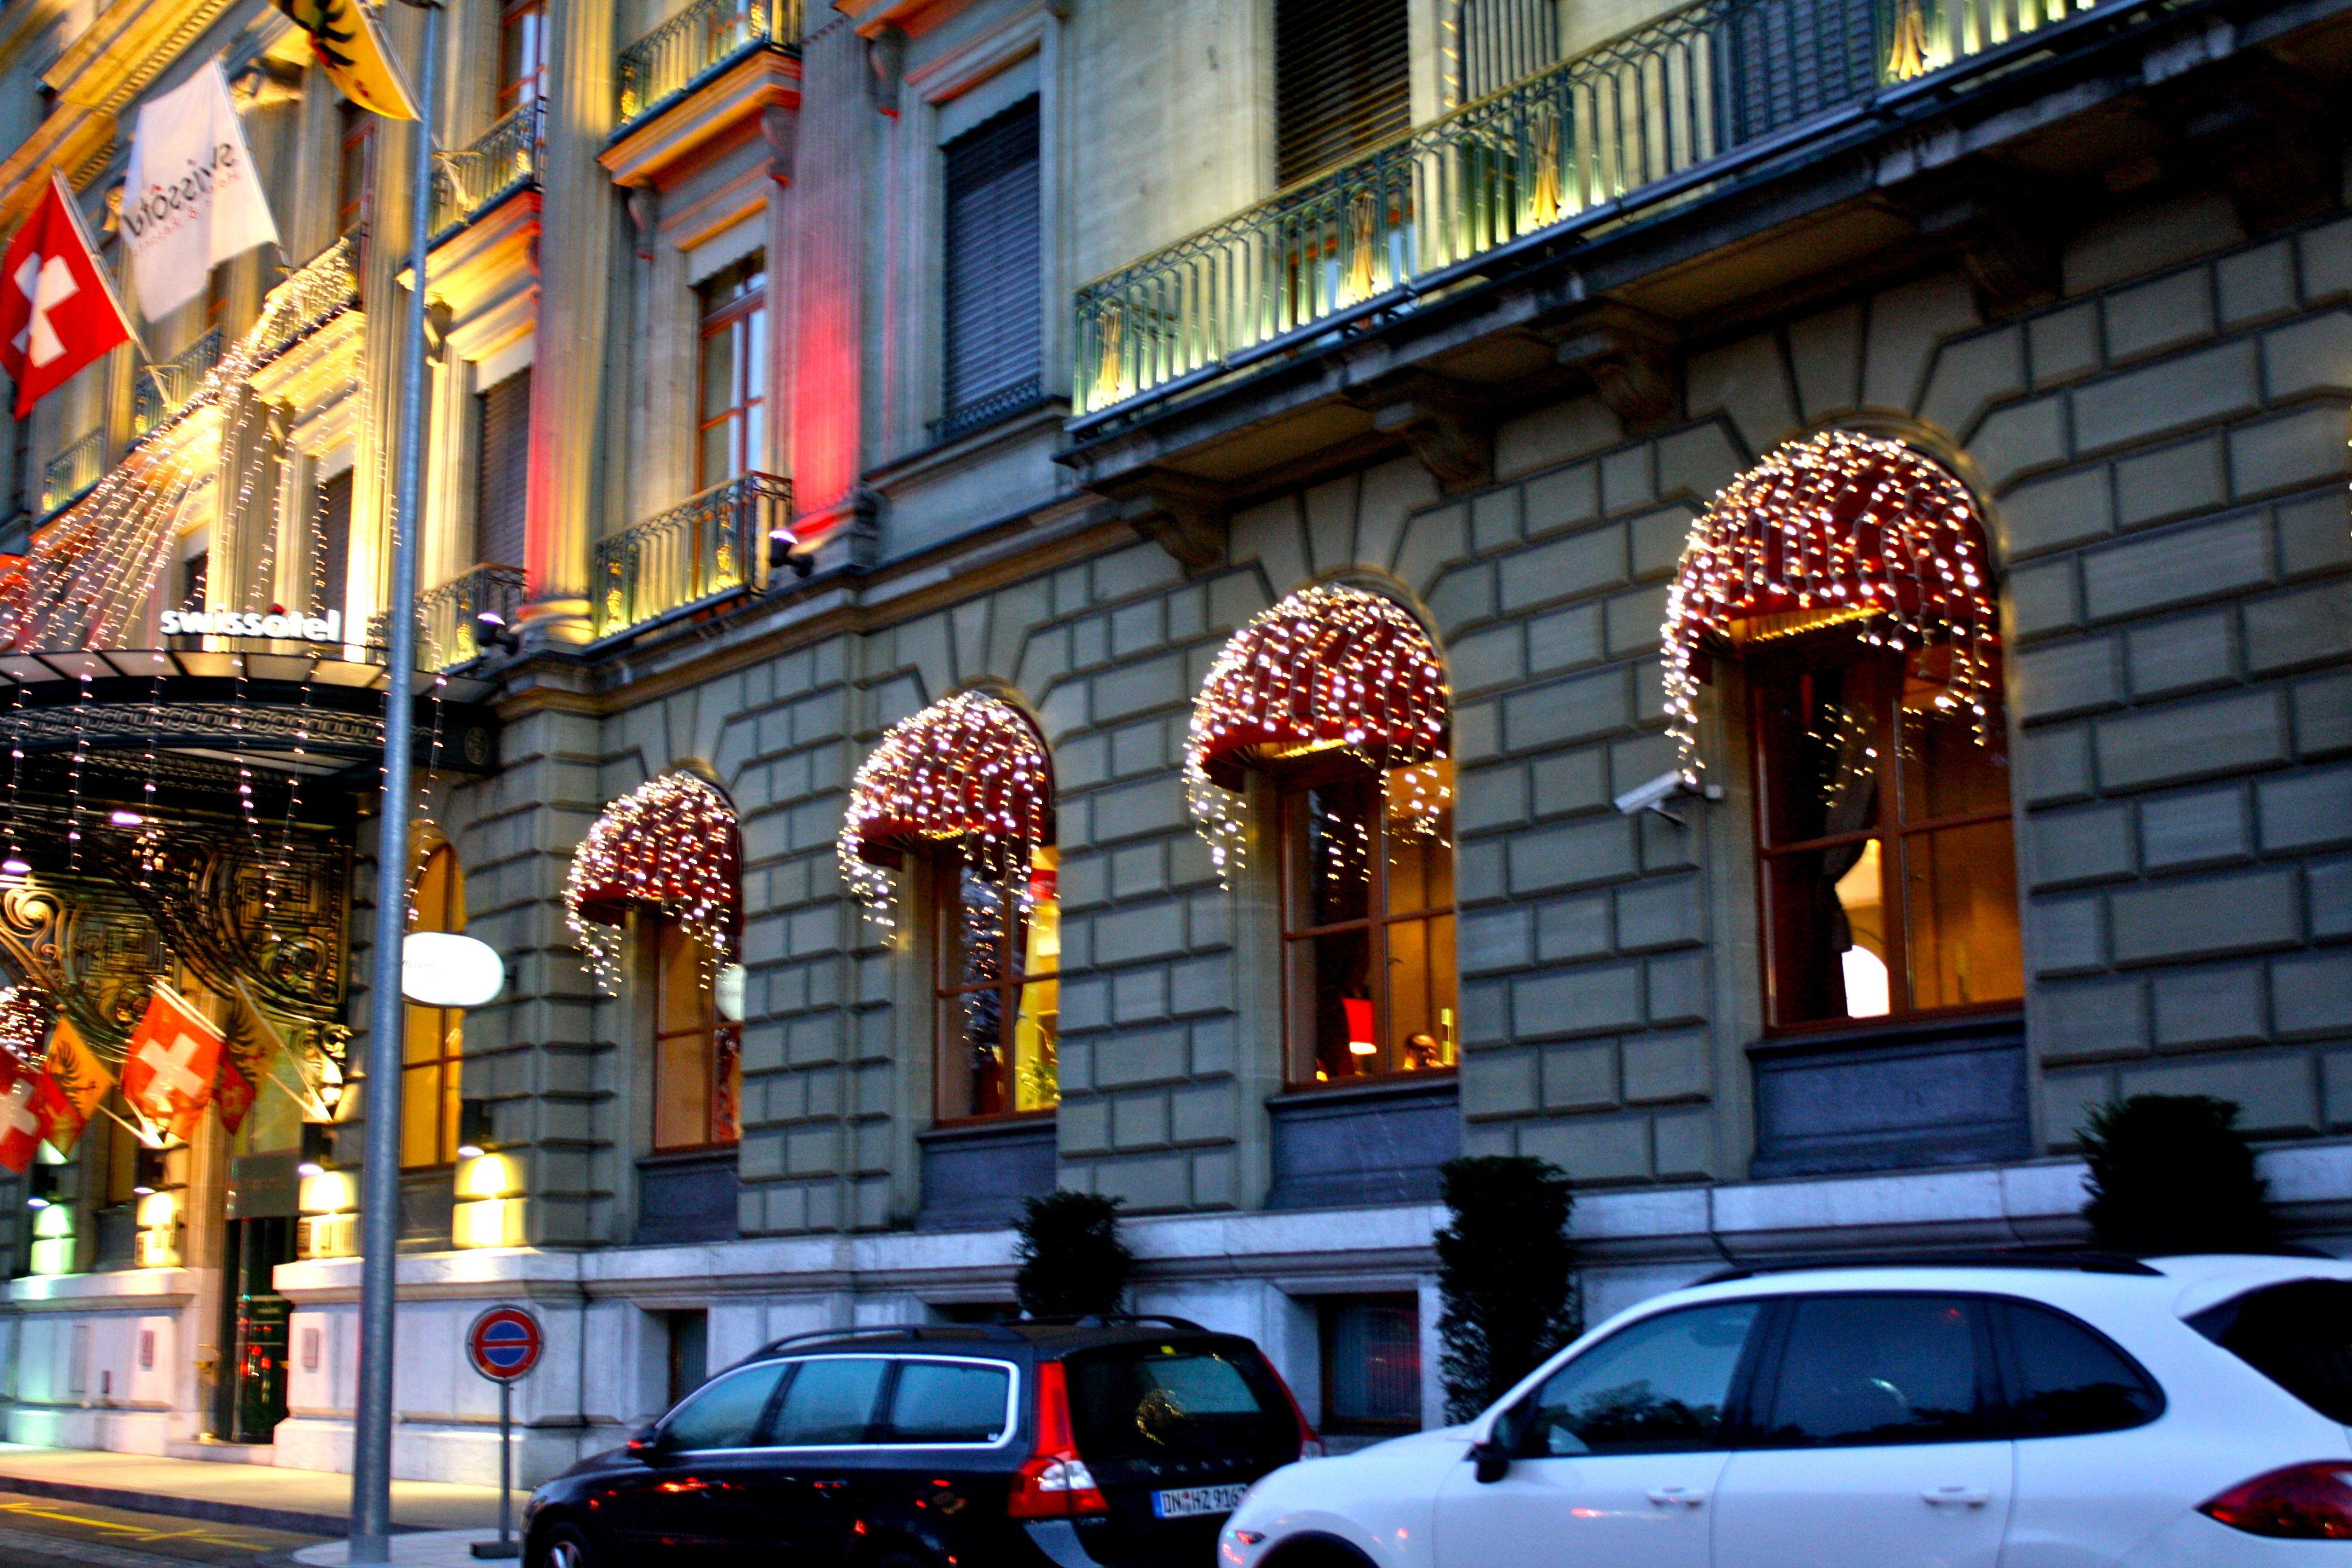 #A58526 Holiday Still Geneva! LUDLUM DRIVE 5545 decorations noel geneve 3888x2592 px @ aertt.com